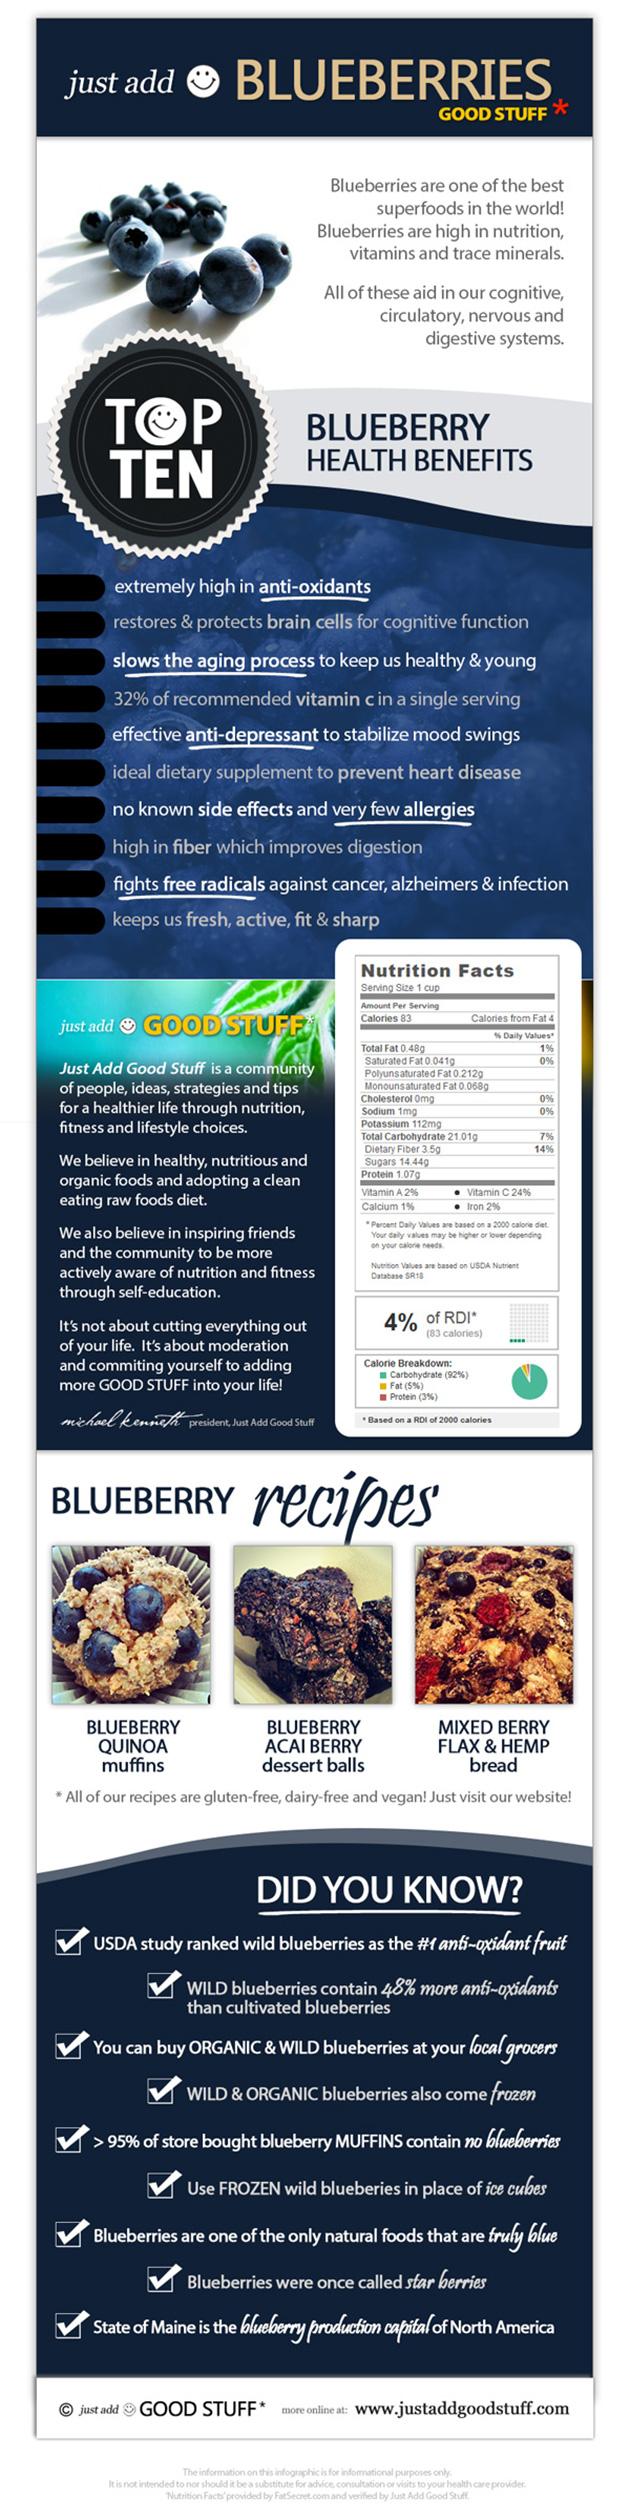 10 Blueberry Benefits Infographic